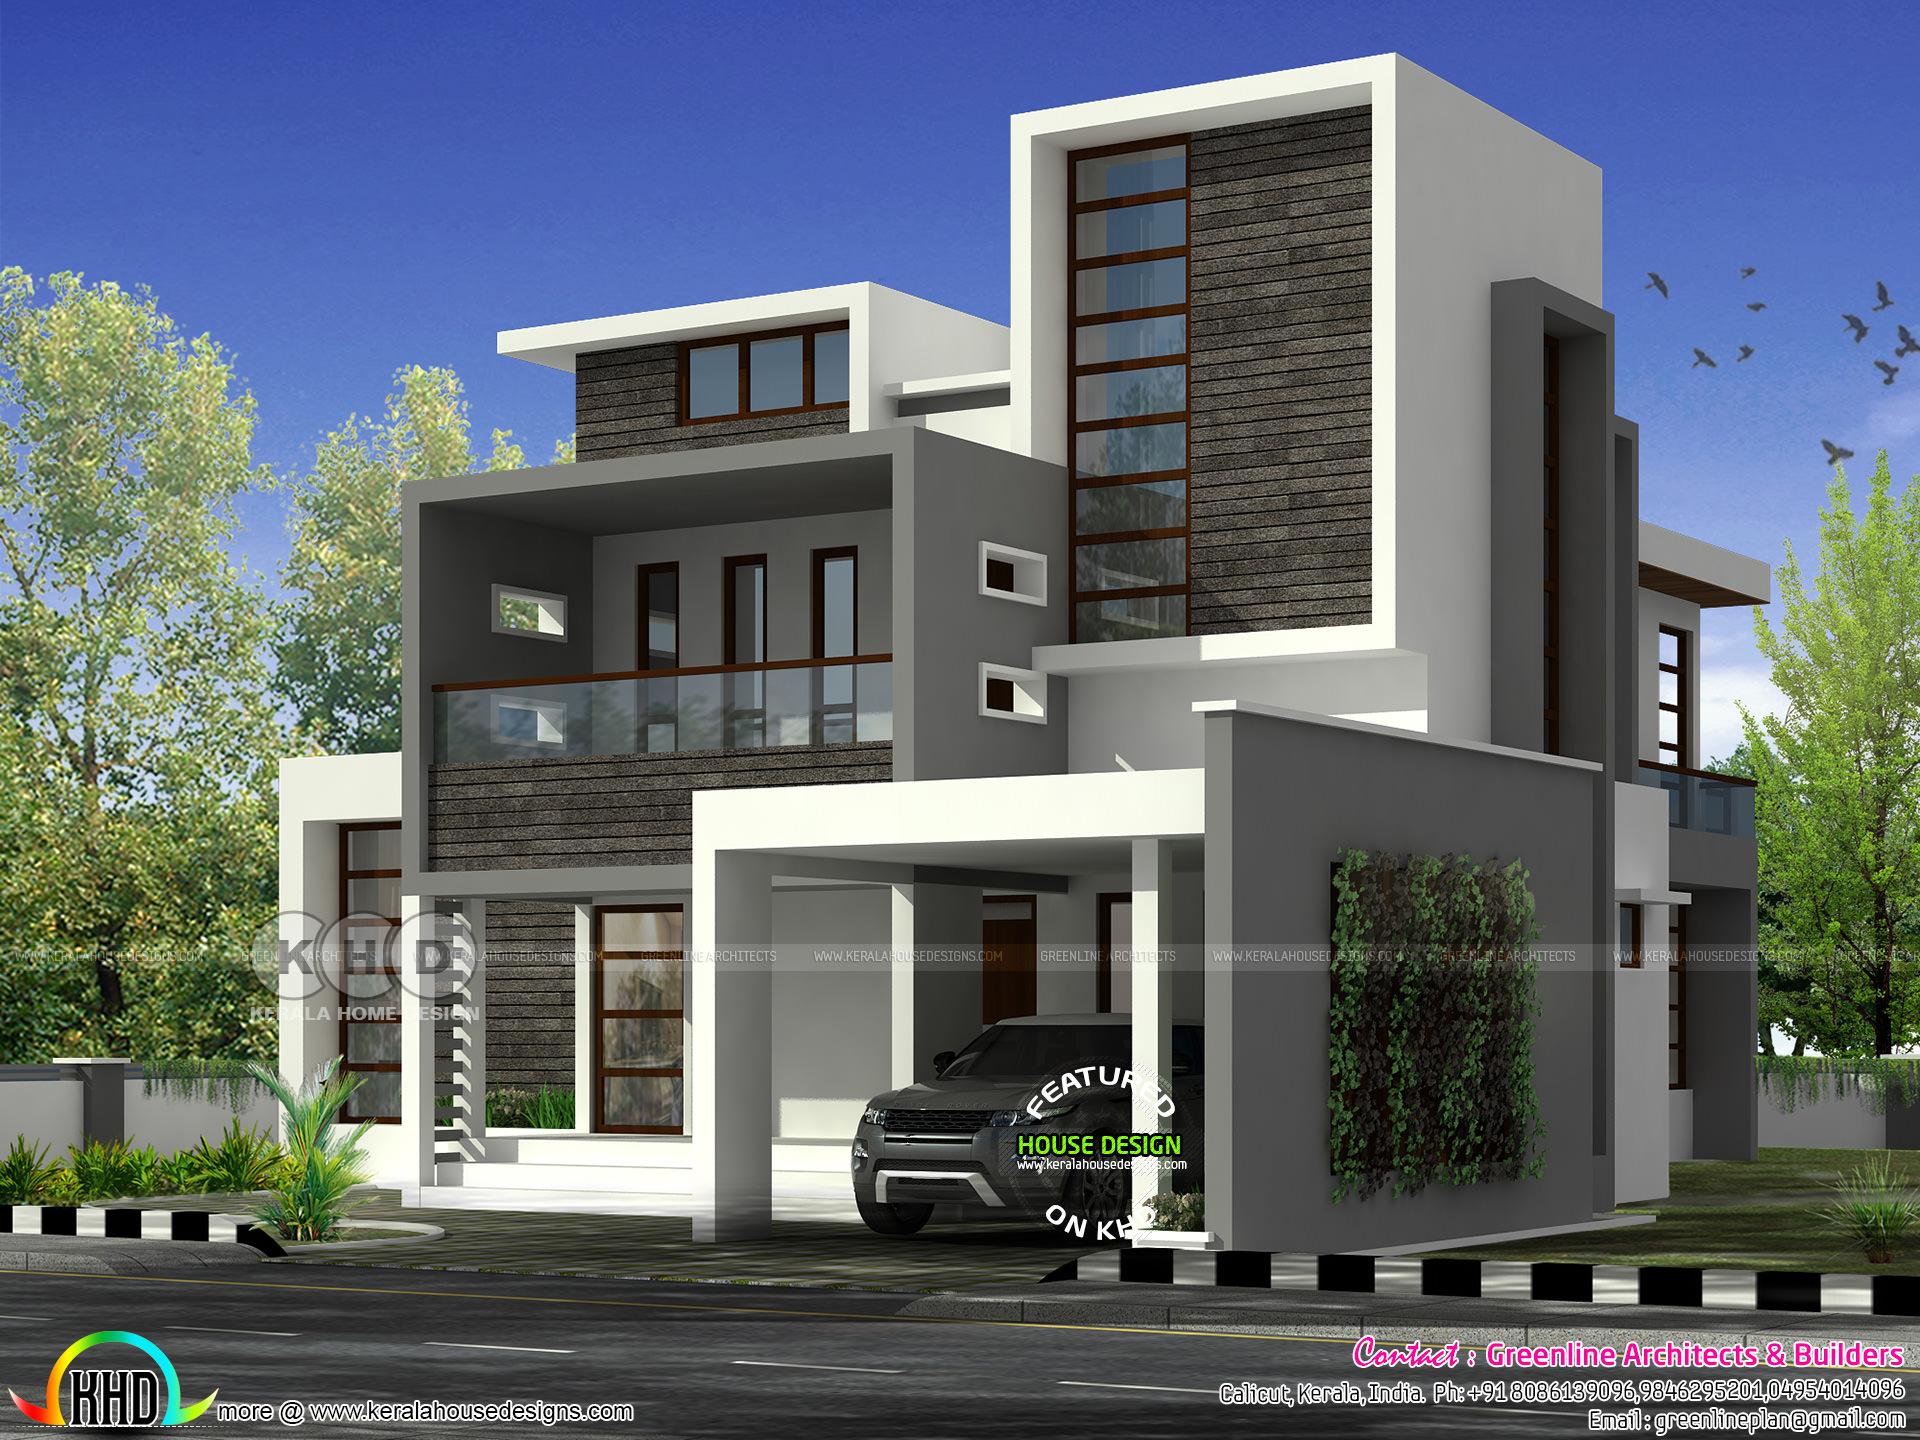 4 bedroom flat roof home 3001 sq-ft - Kerala home design ...